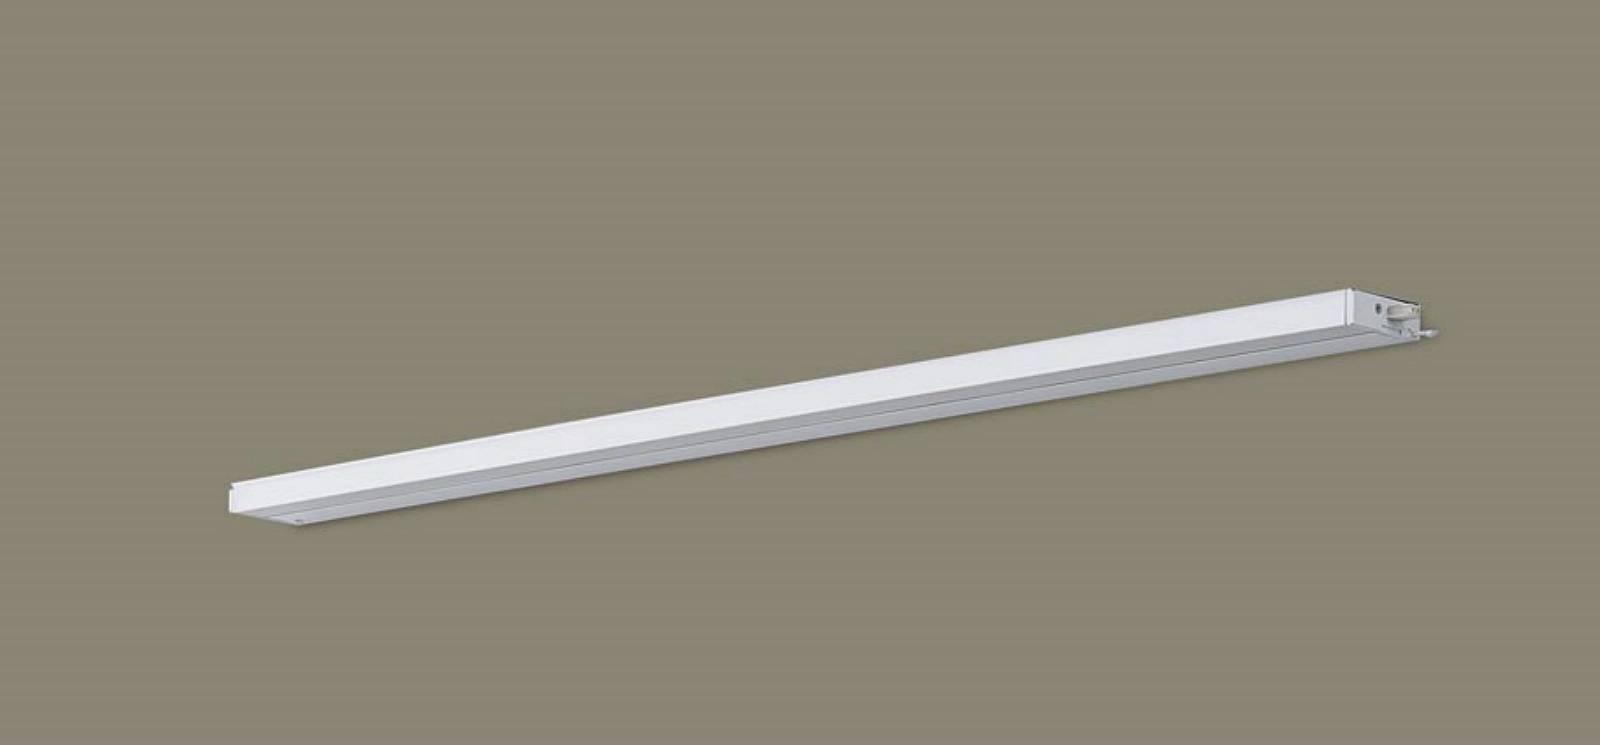 T区分 パナソニック LGB51156LG1 ベースライト 建築化照明器具 単独使用不可 畳数設定無し LED【setsuden_led】